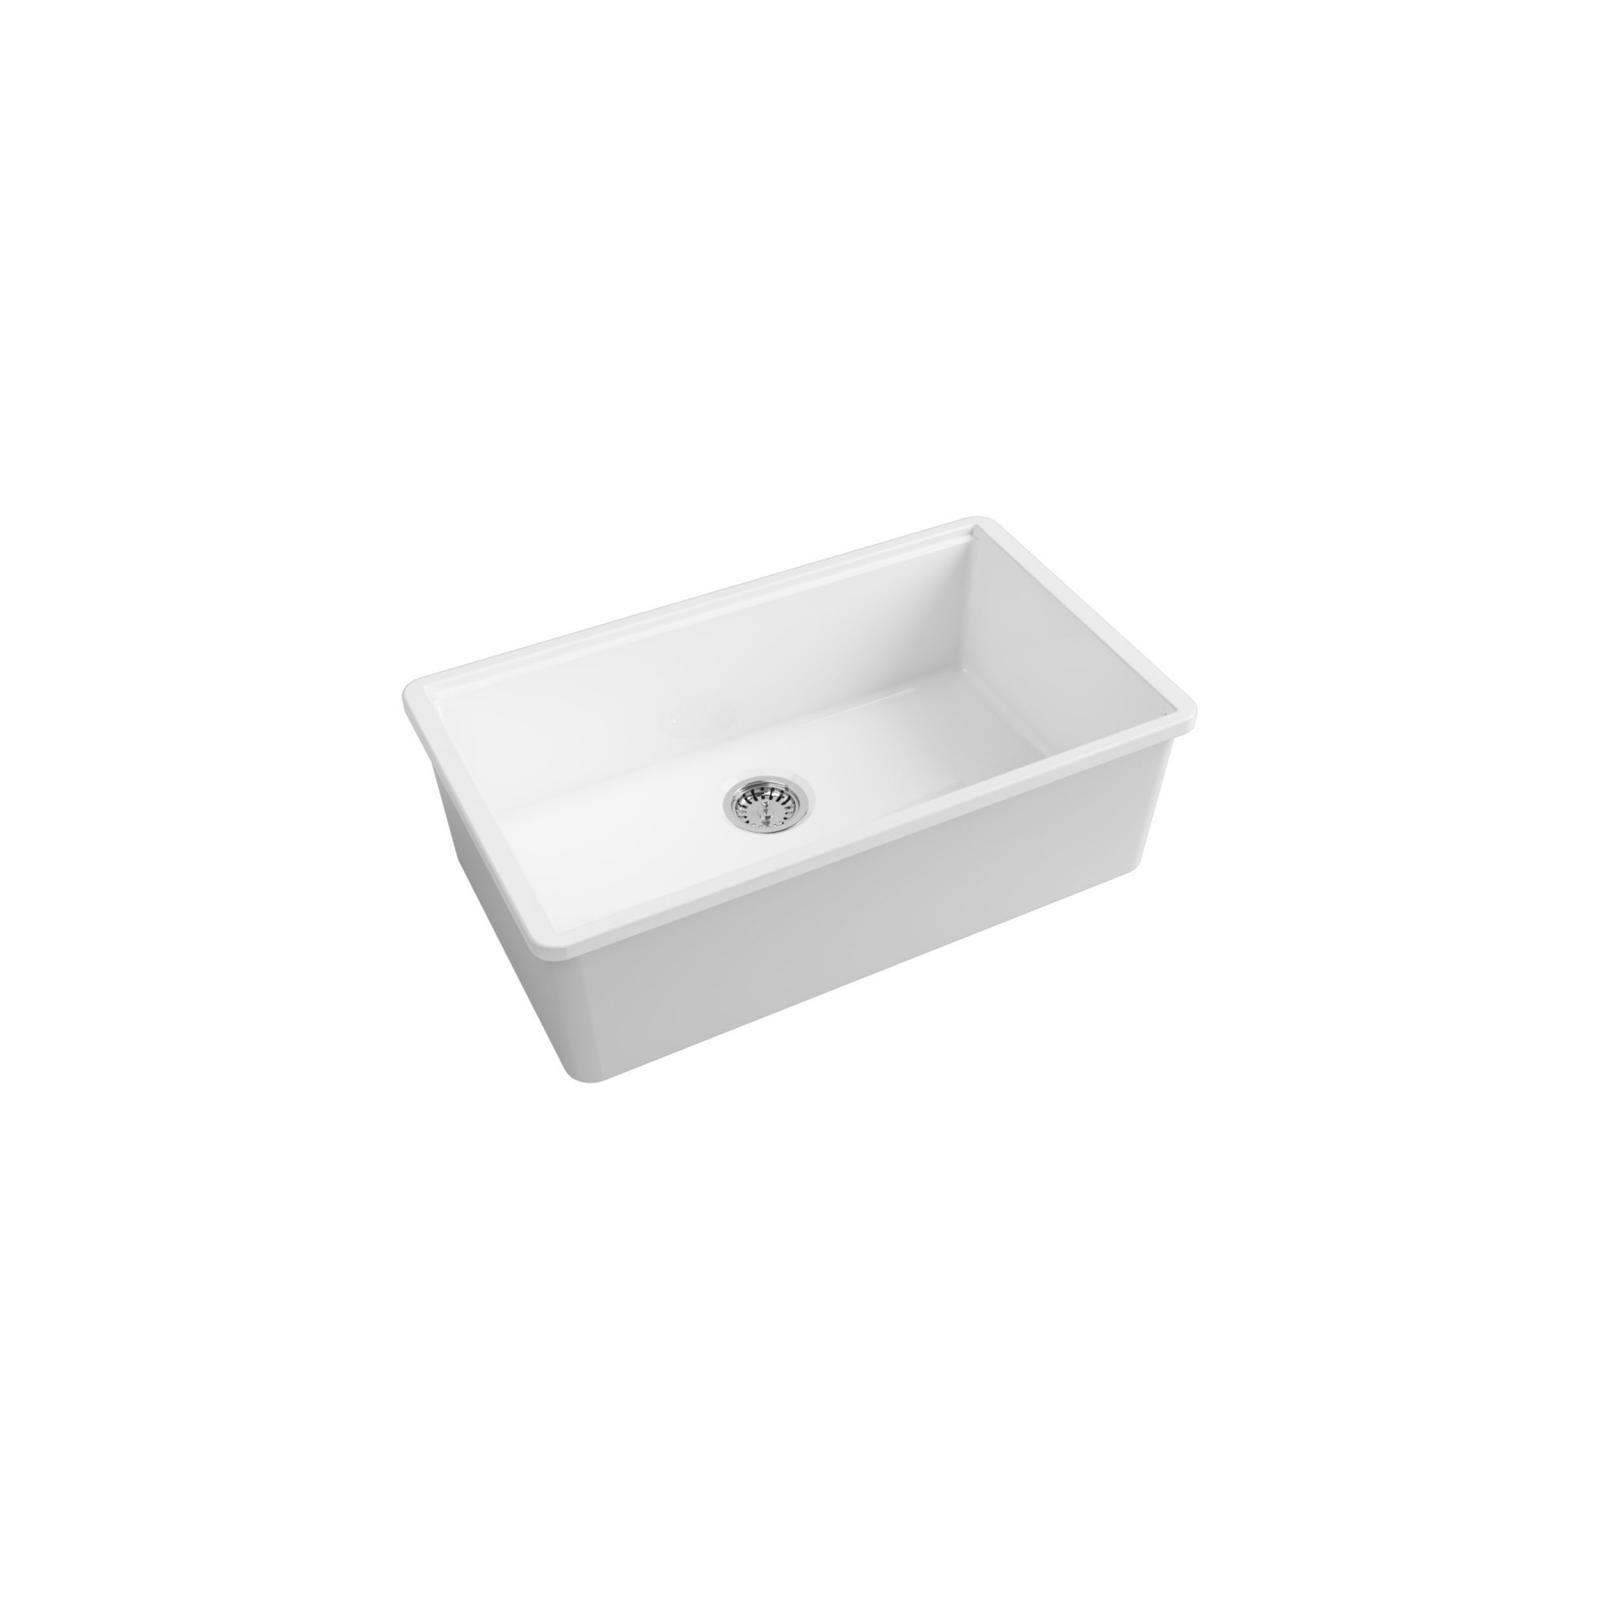 High-quality sink Anne white - single bowl, ceramic